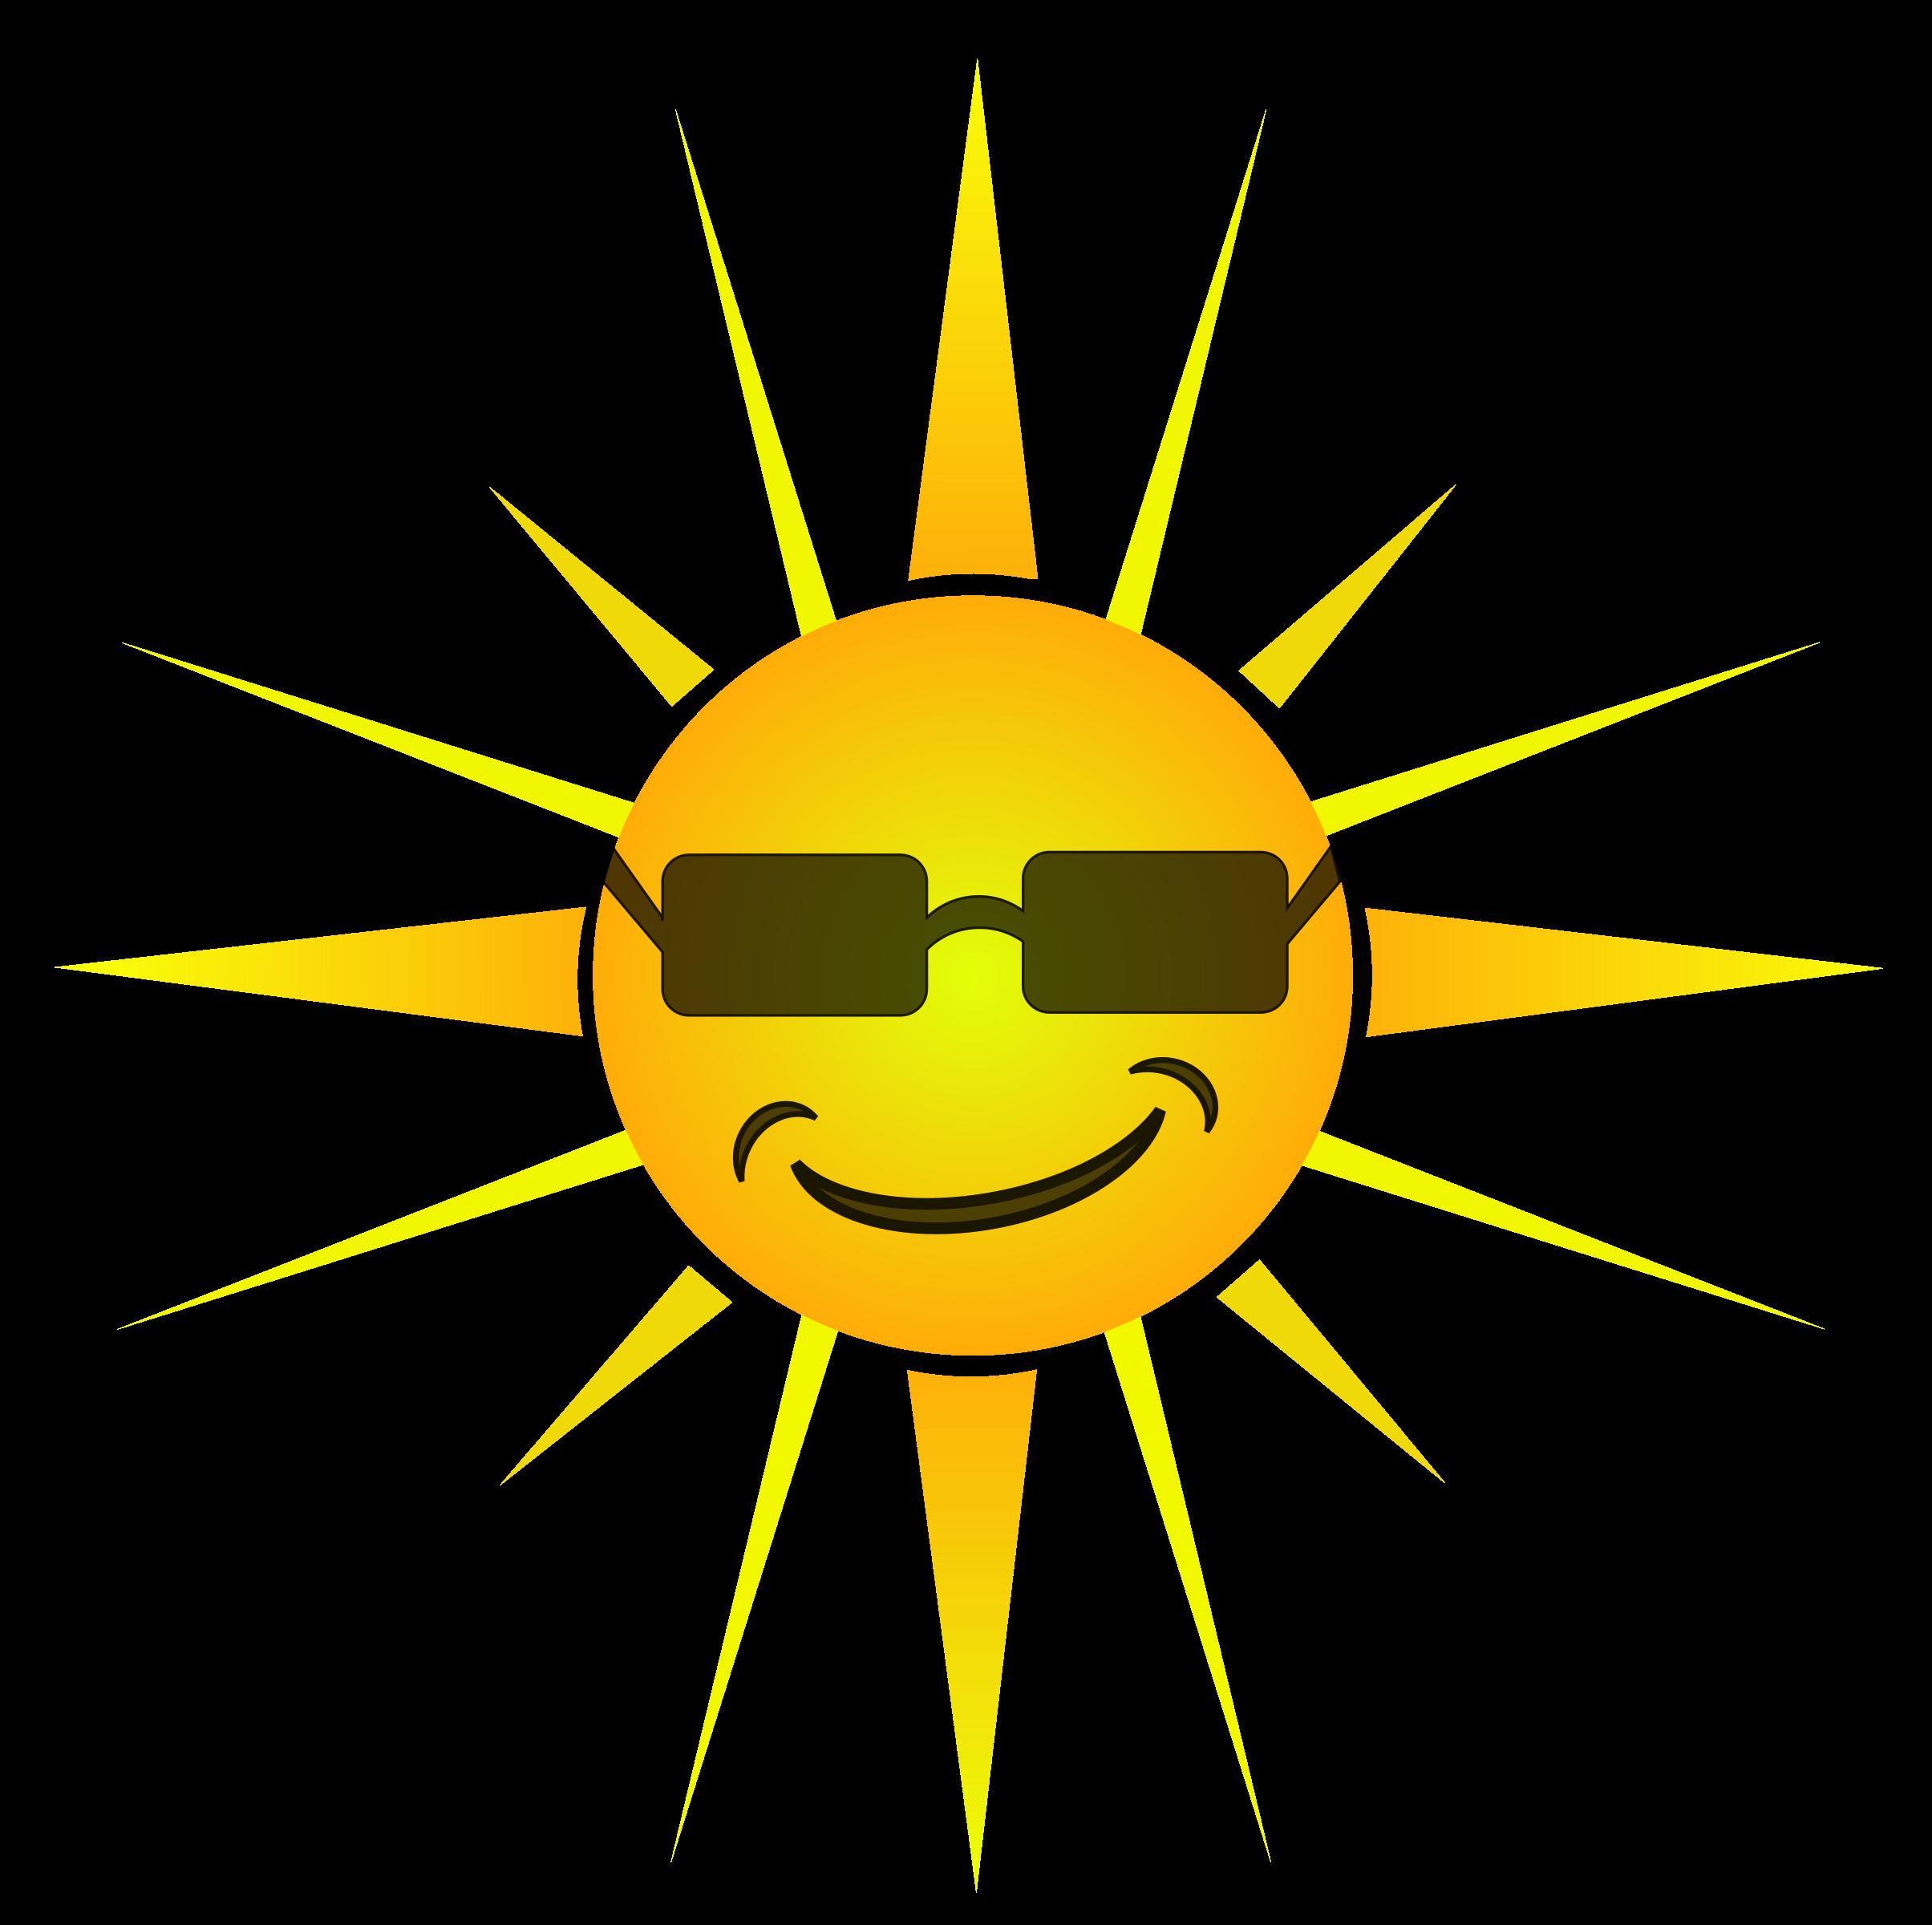 Happy sun big image. Sunny clipart cool sunglasses